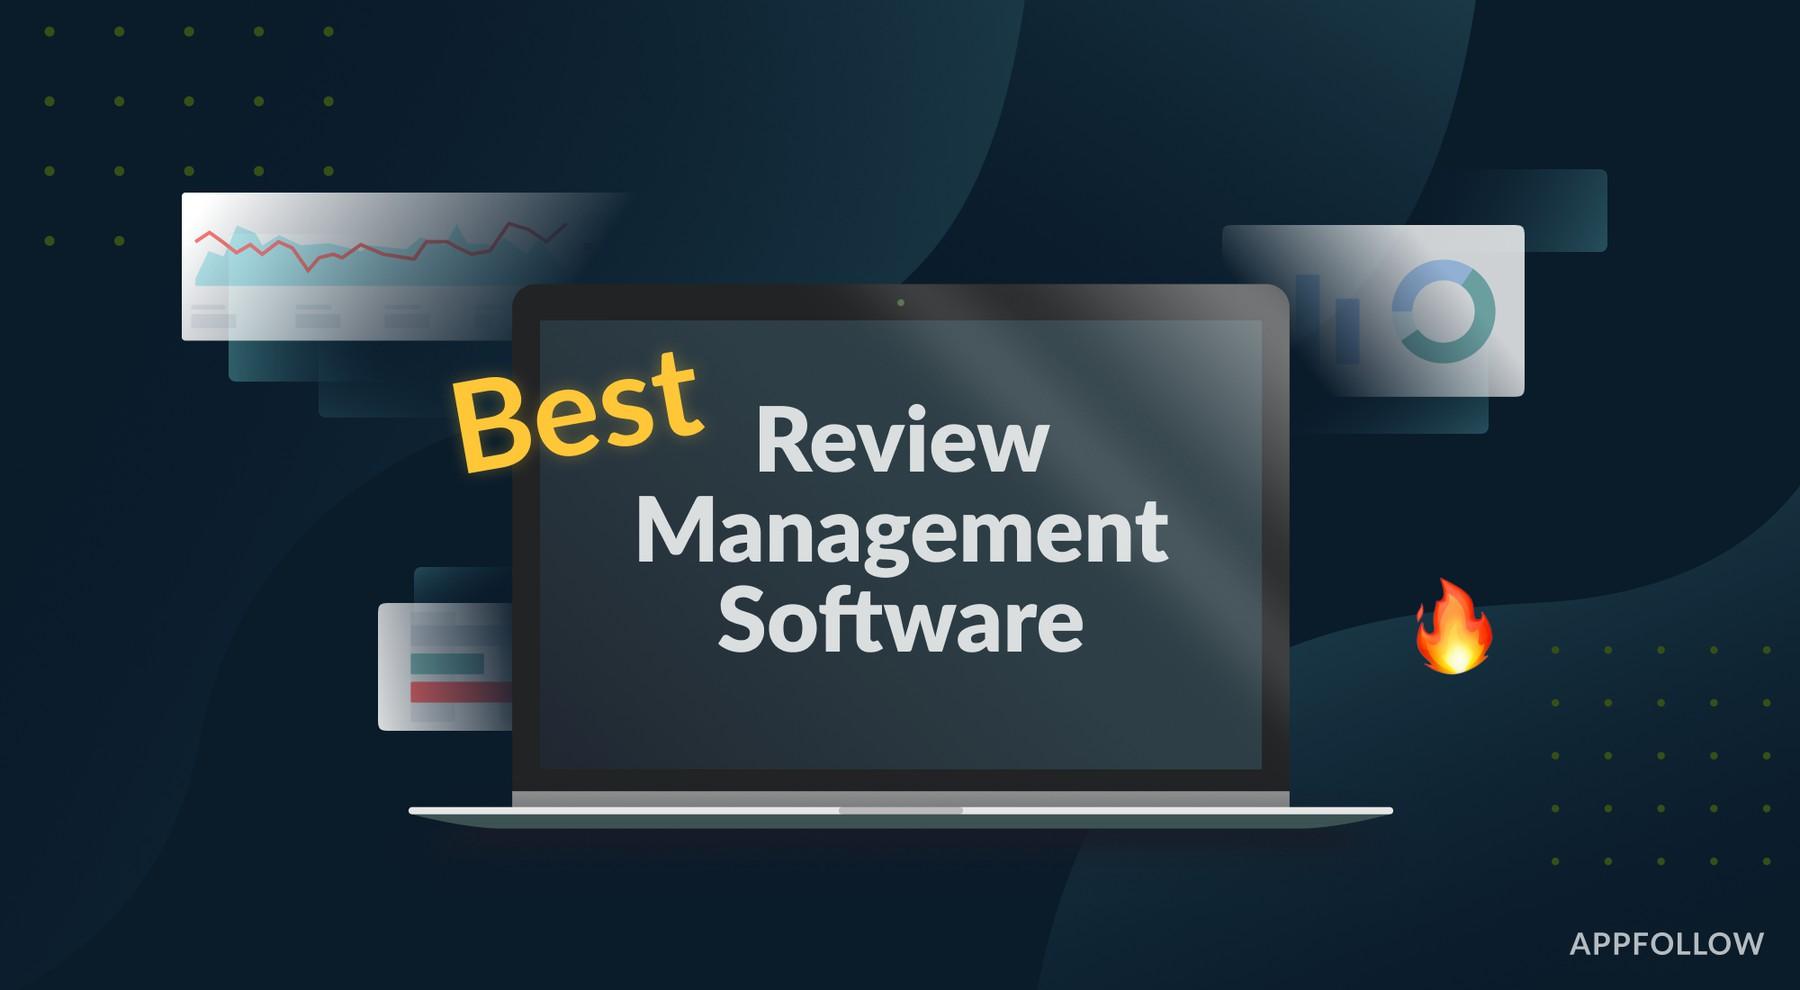 Best Review Management Software 2020